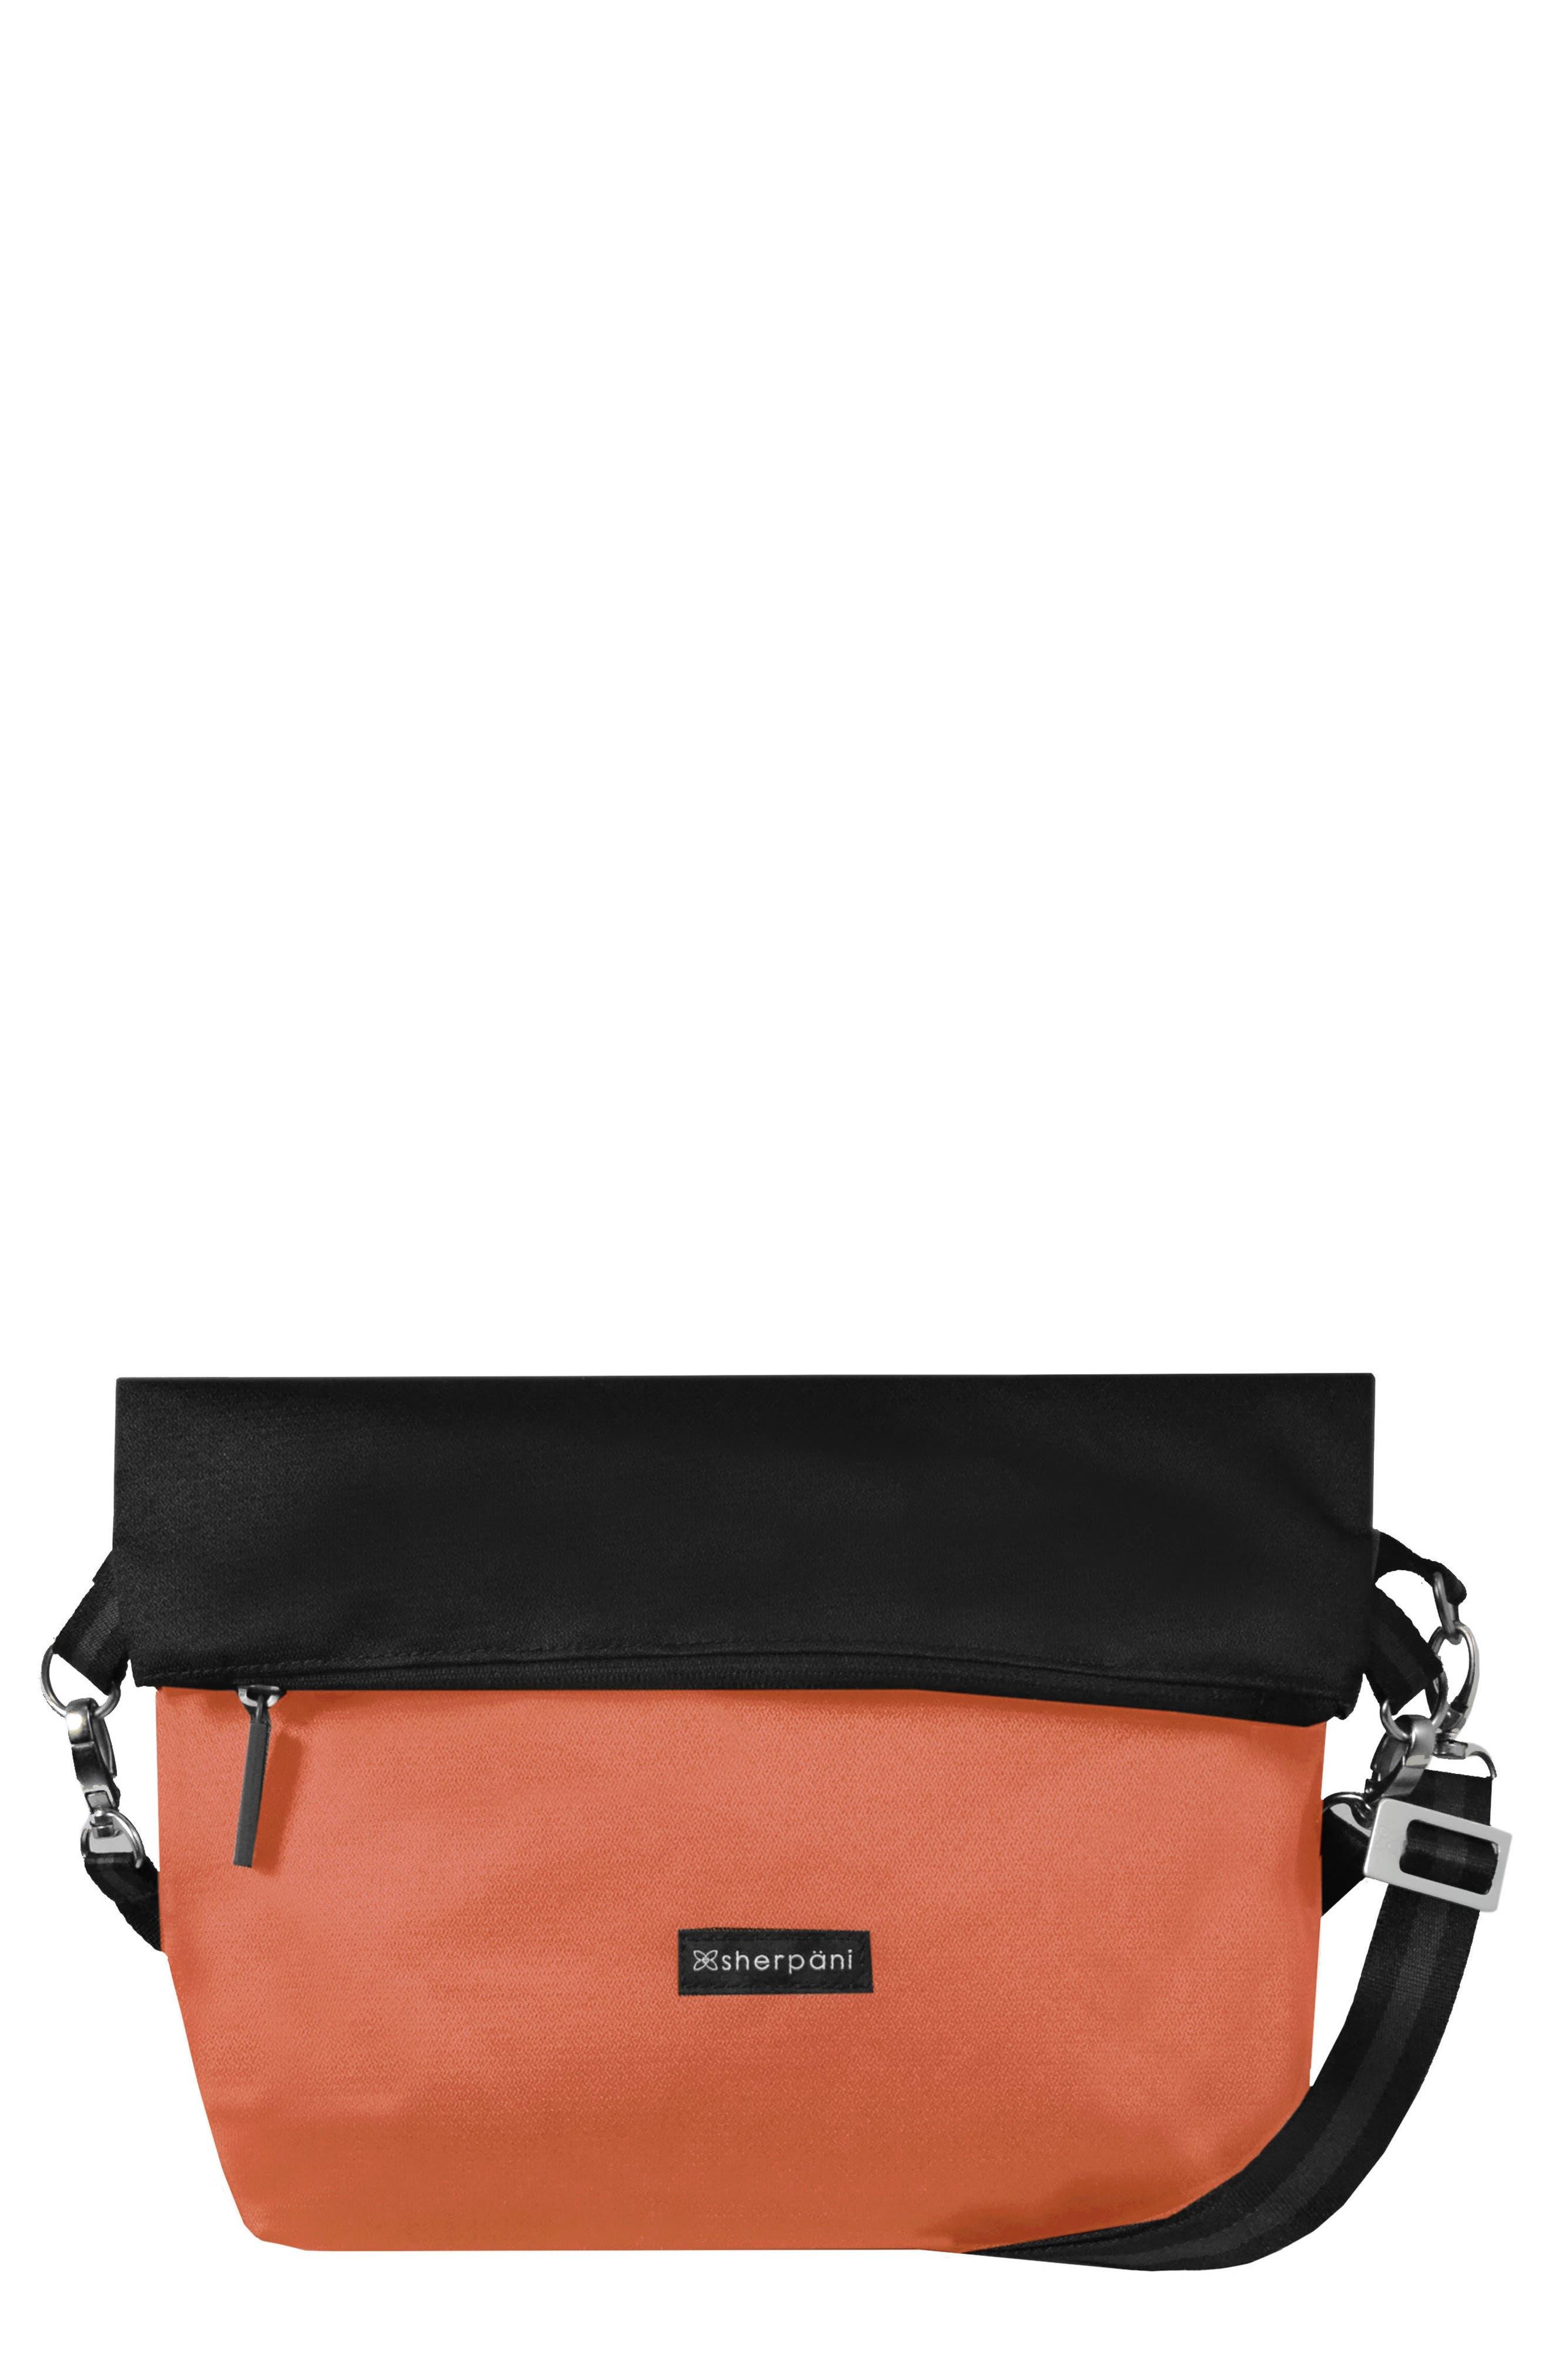 Sherpani Vale Reversible Crossbody Bag